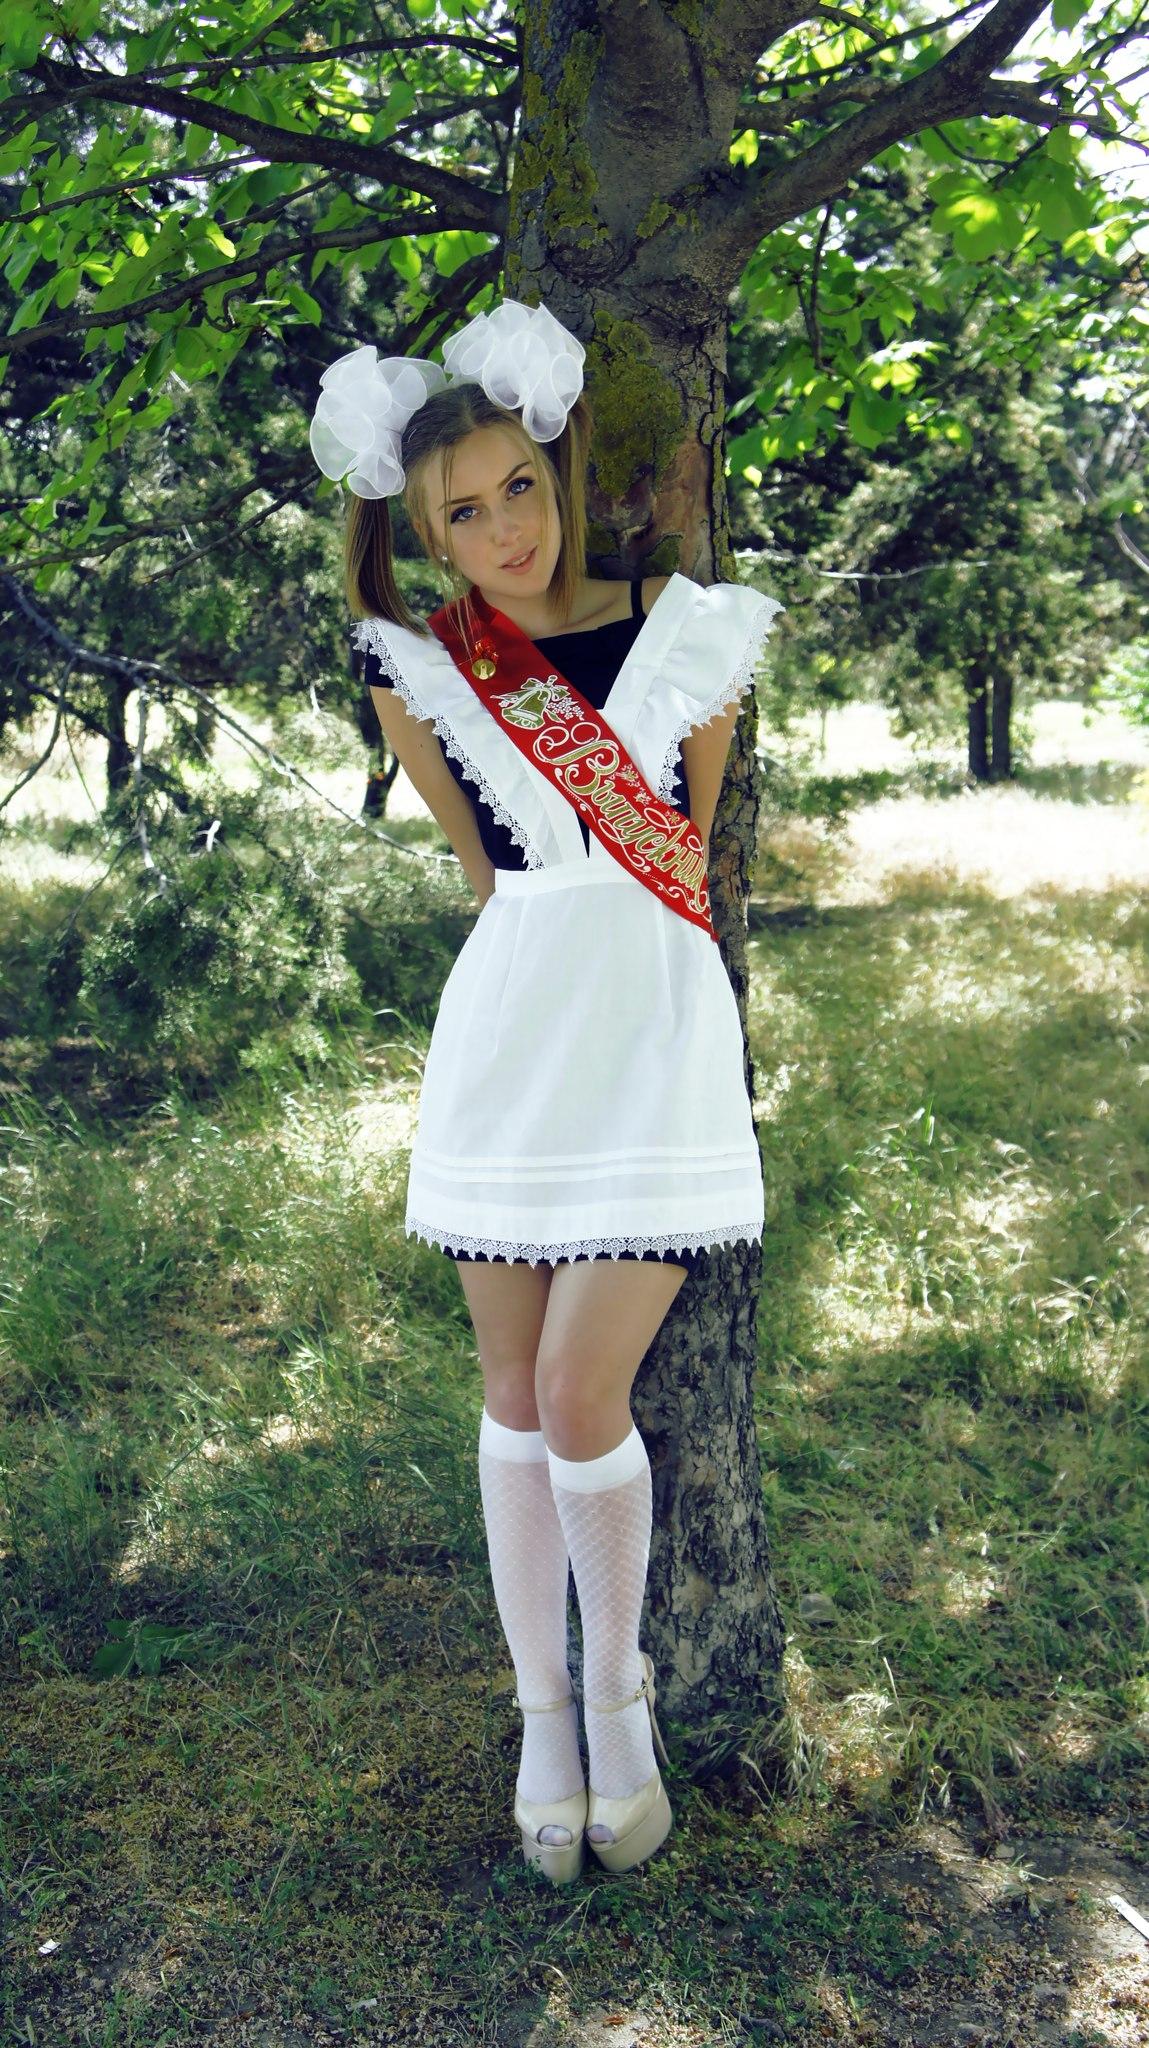 Фото выпускница в форме 2 фотография